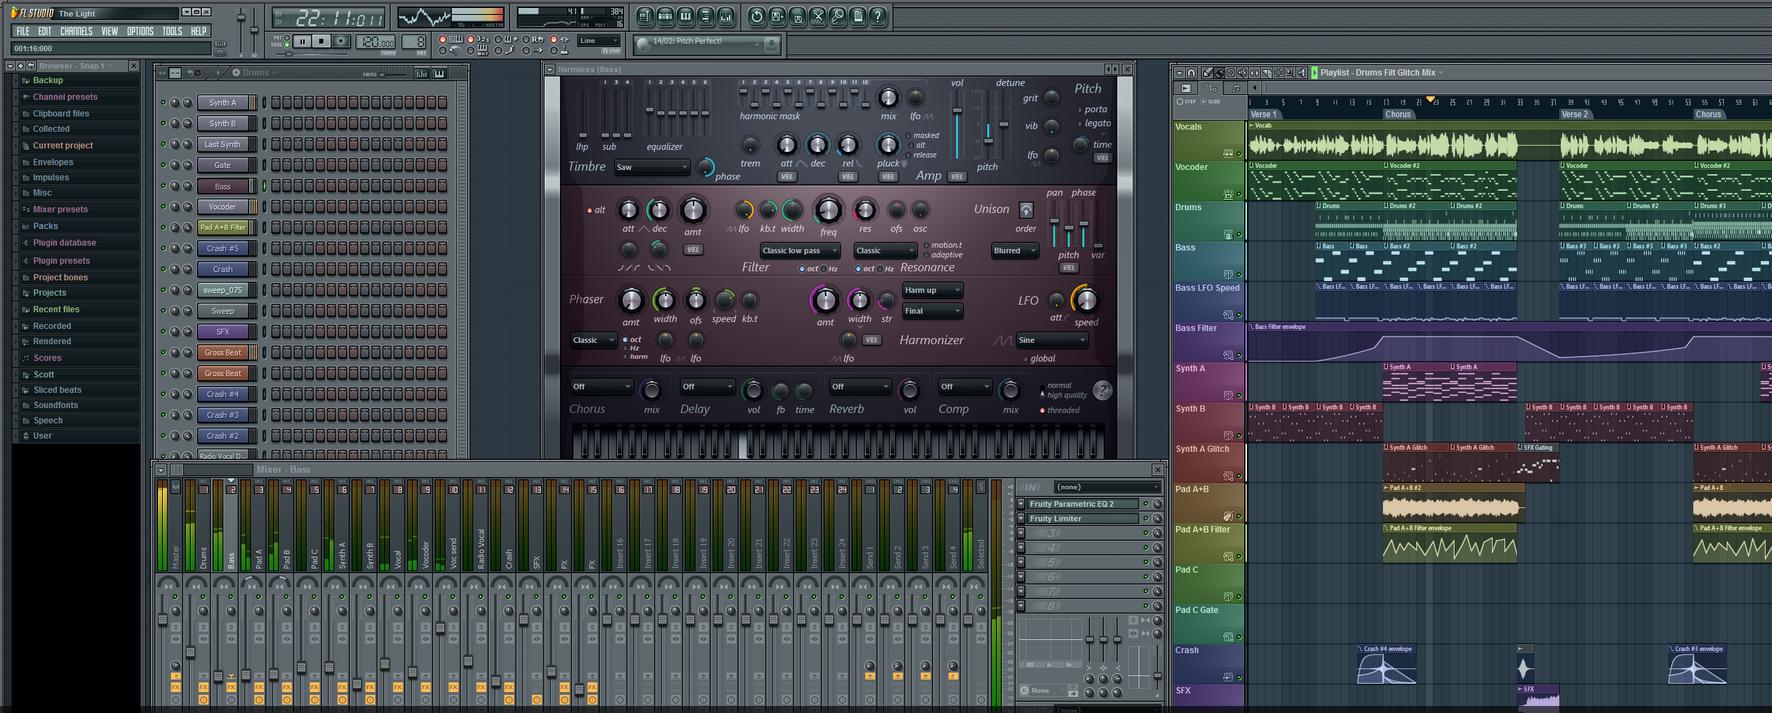 FL Studio 10 Martin garrix, Vocal, Tutorial